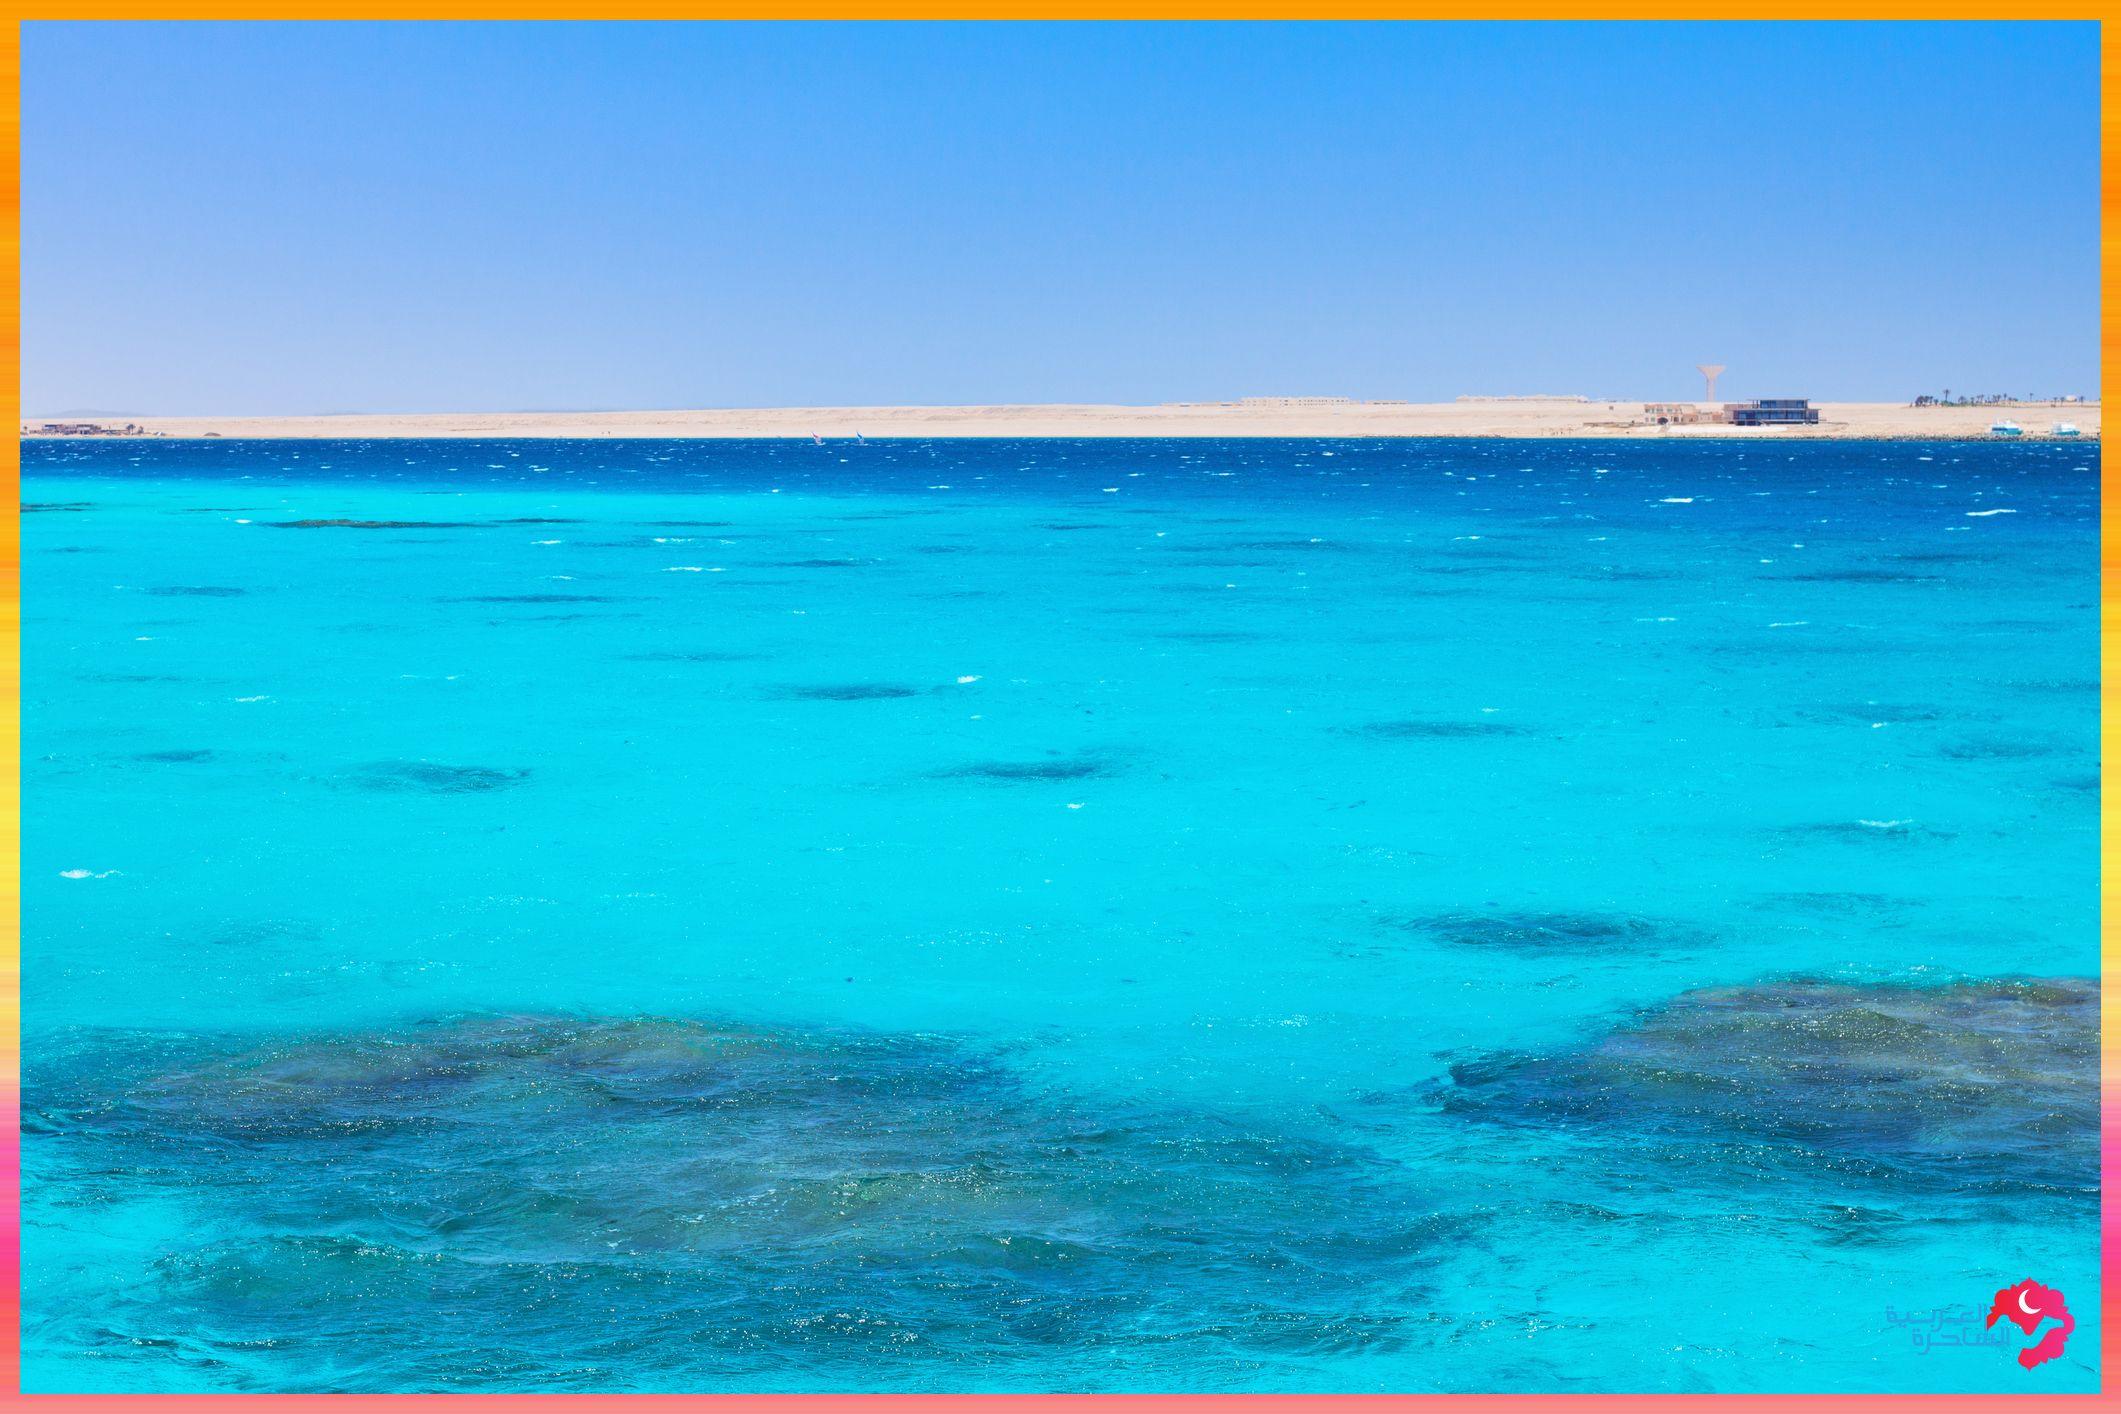 Red Sea Egypt البحر الأحمر مصر Www Batuta Com Travel List Egypt Travel